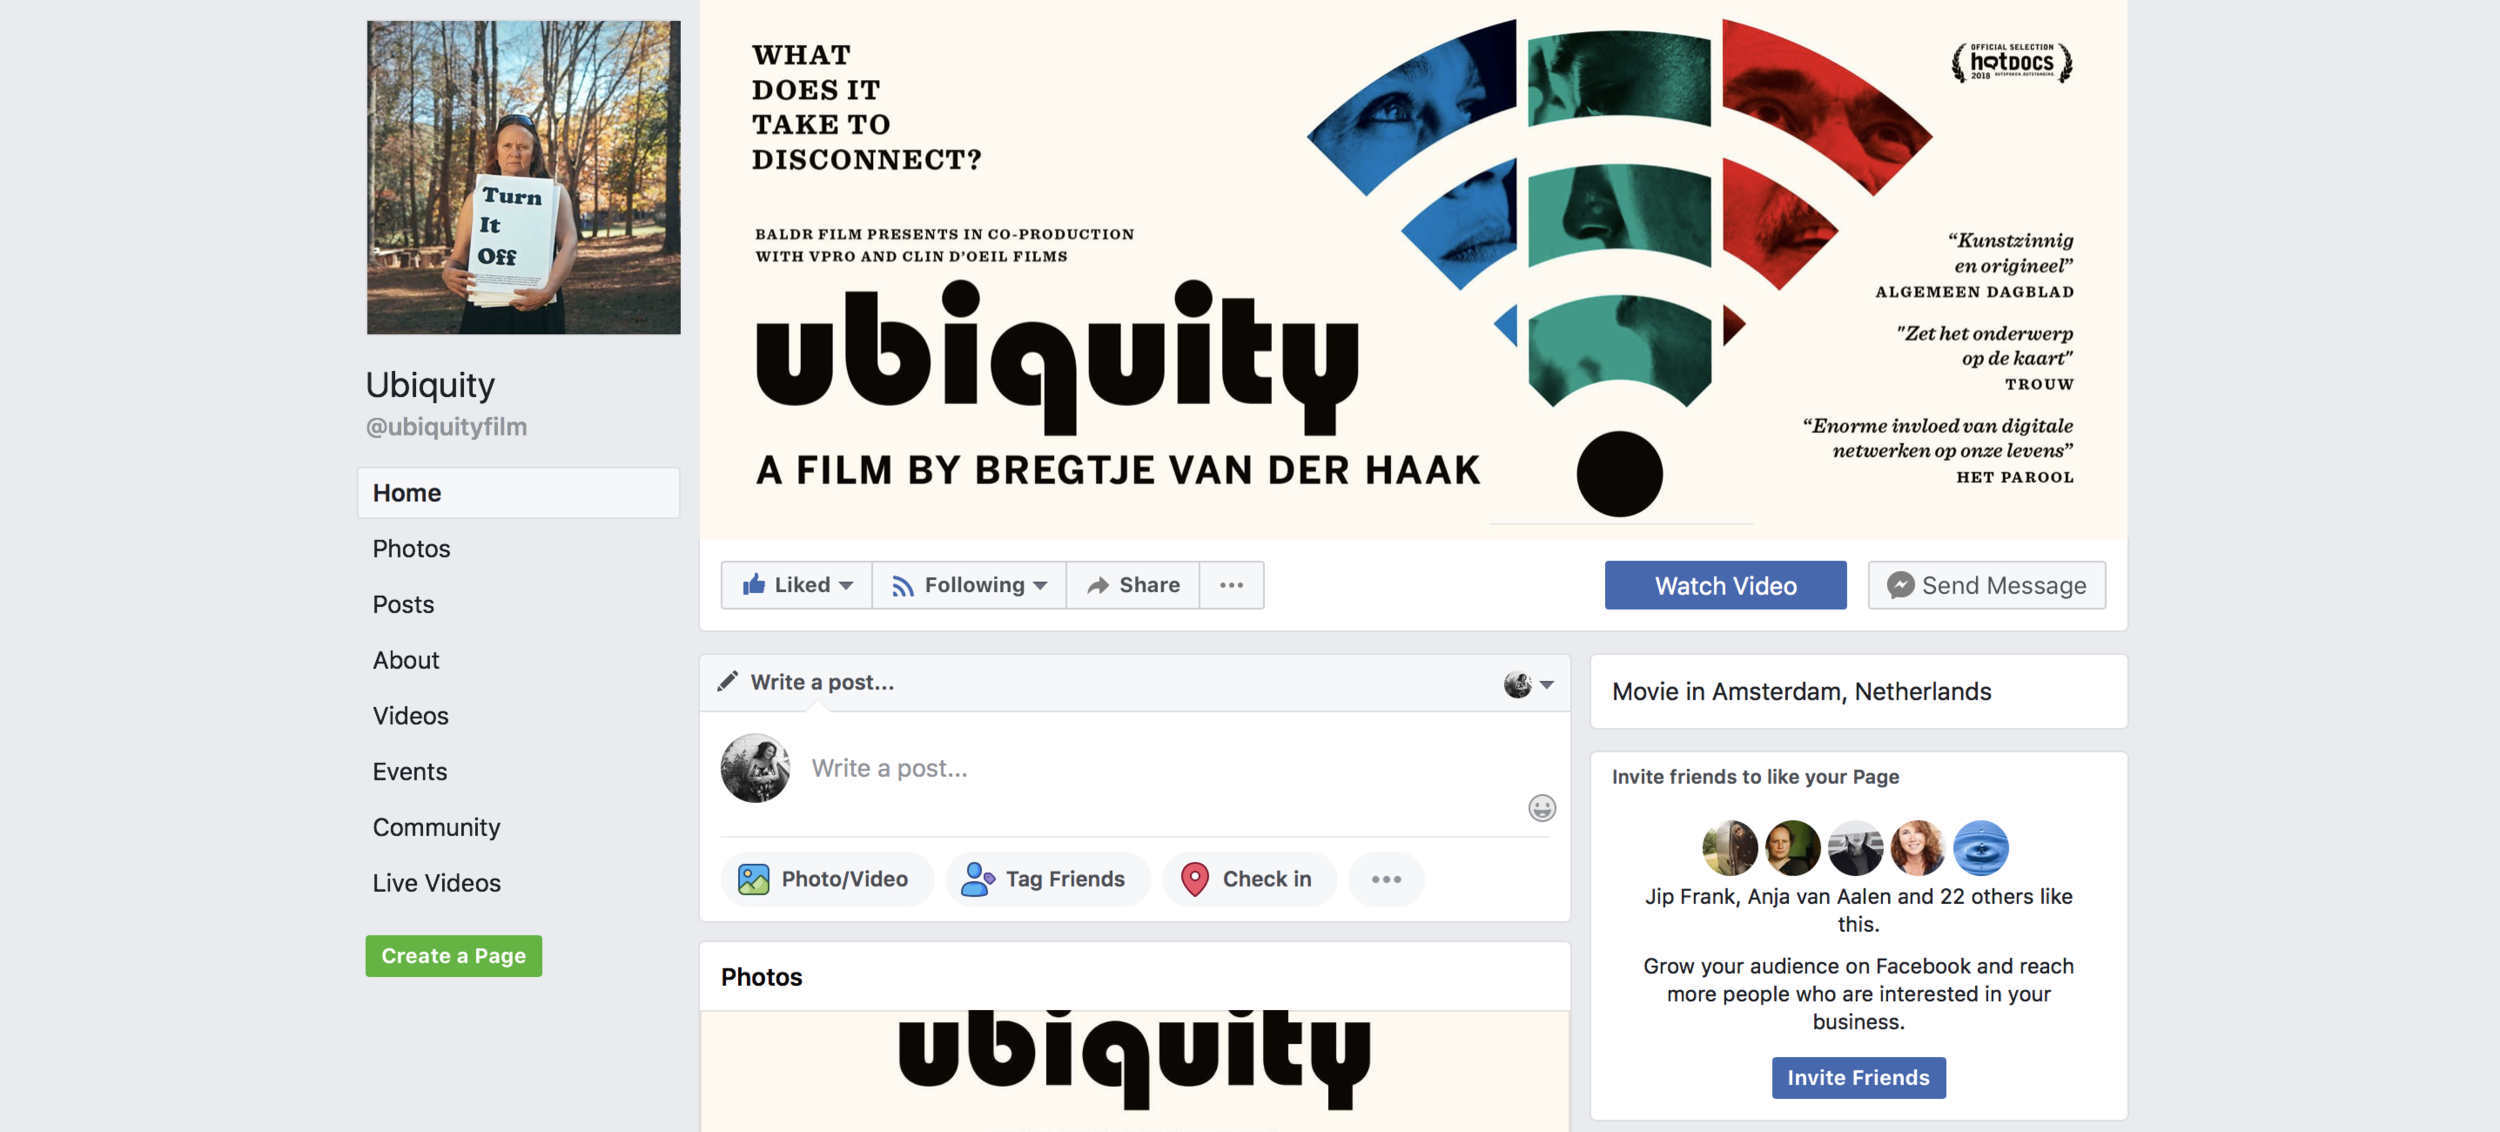 Facebook Ubiquity